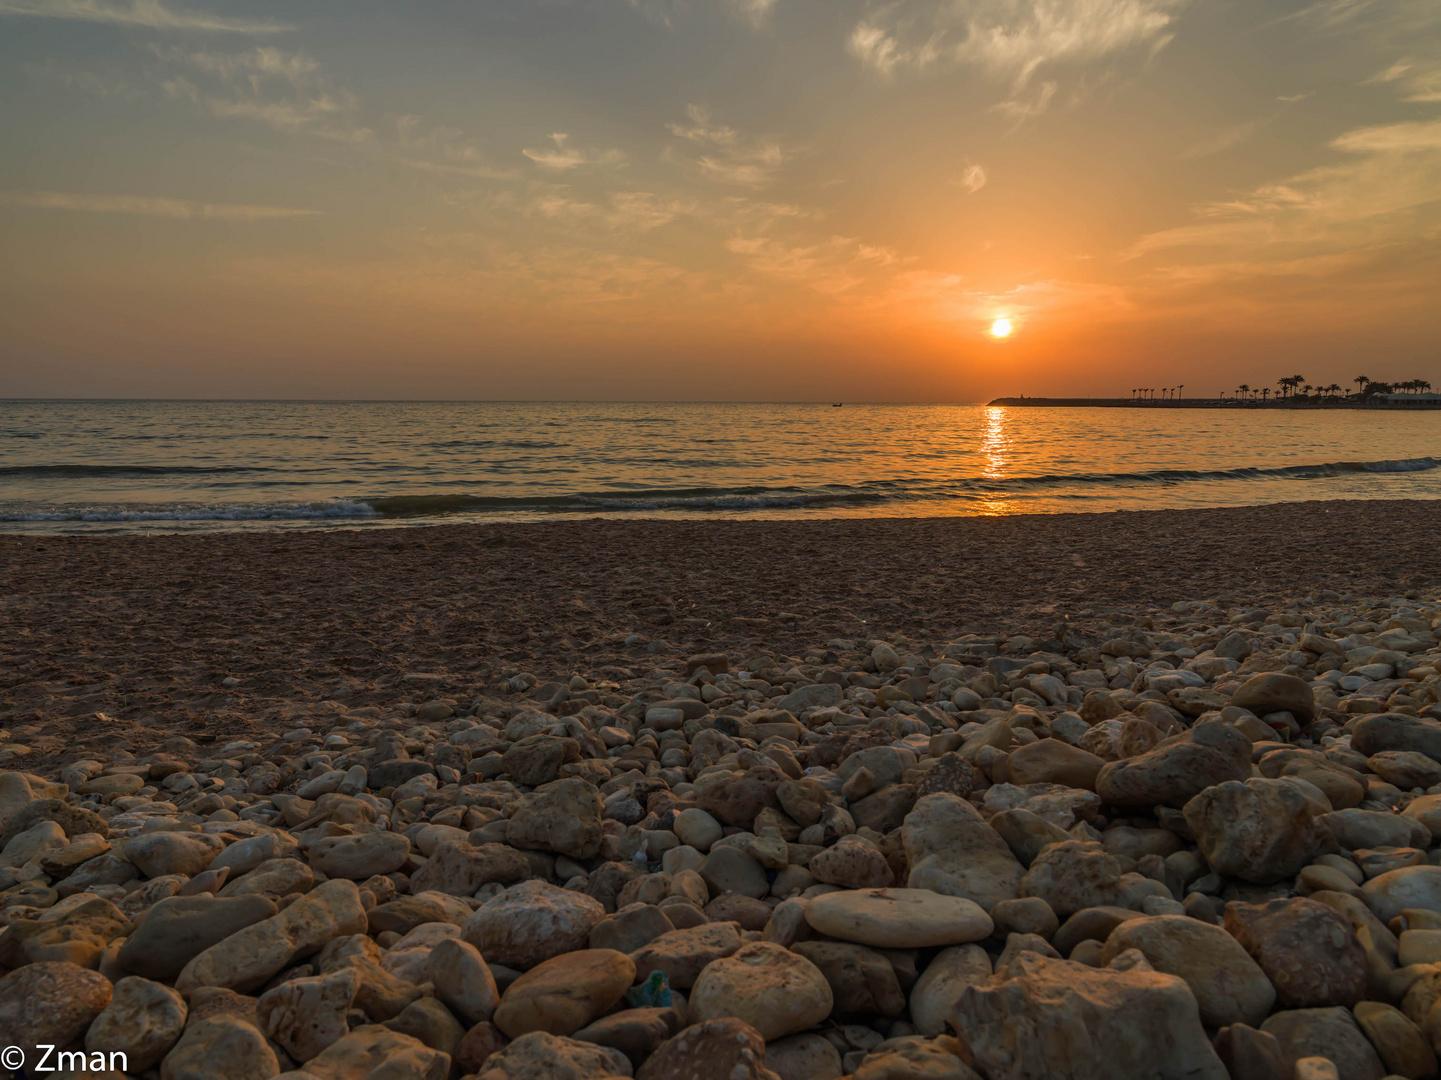 Rocks, Sands, Sea and Sunset  B0002278-10